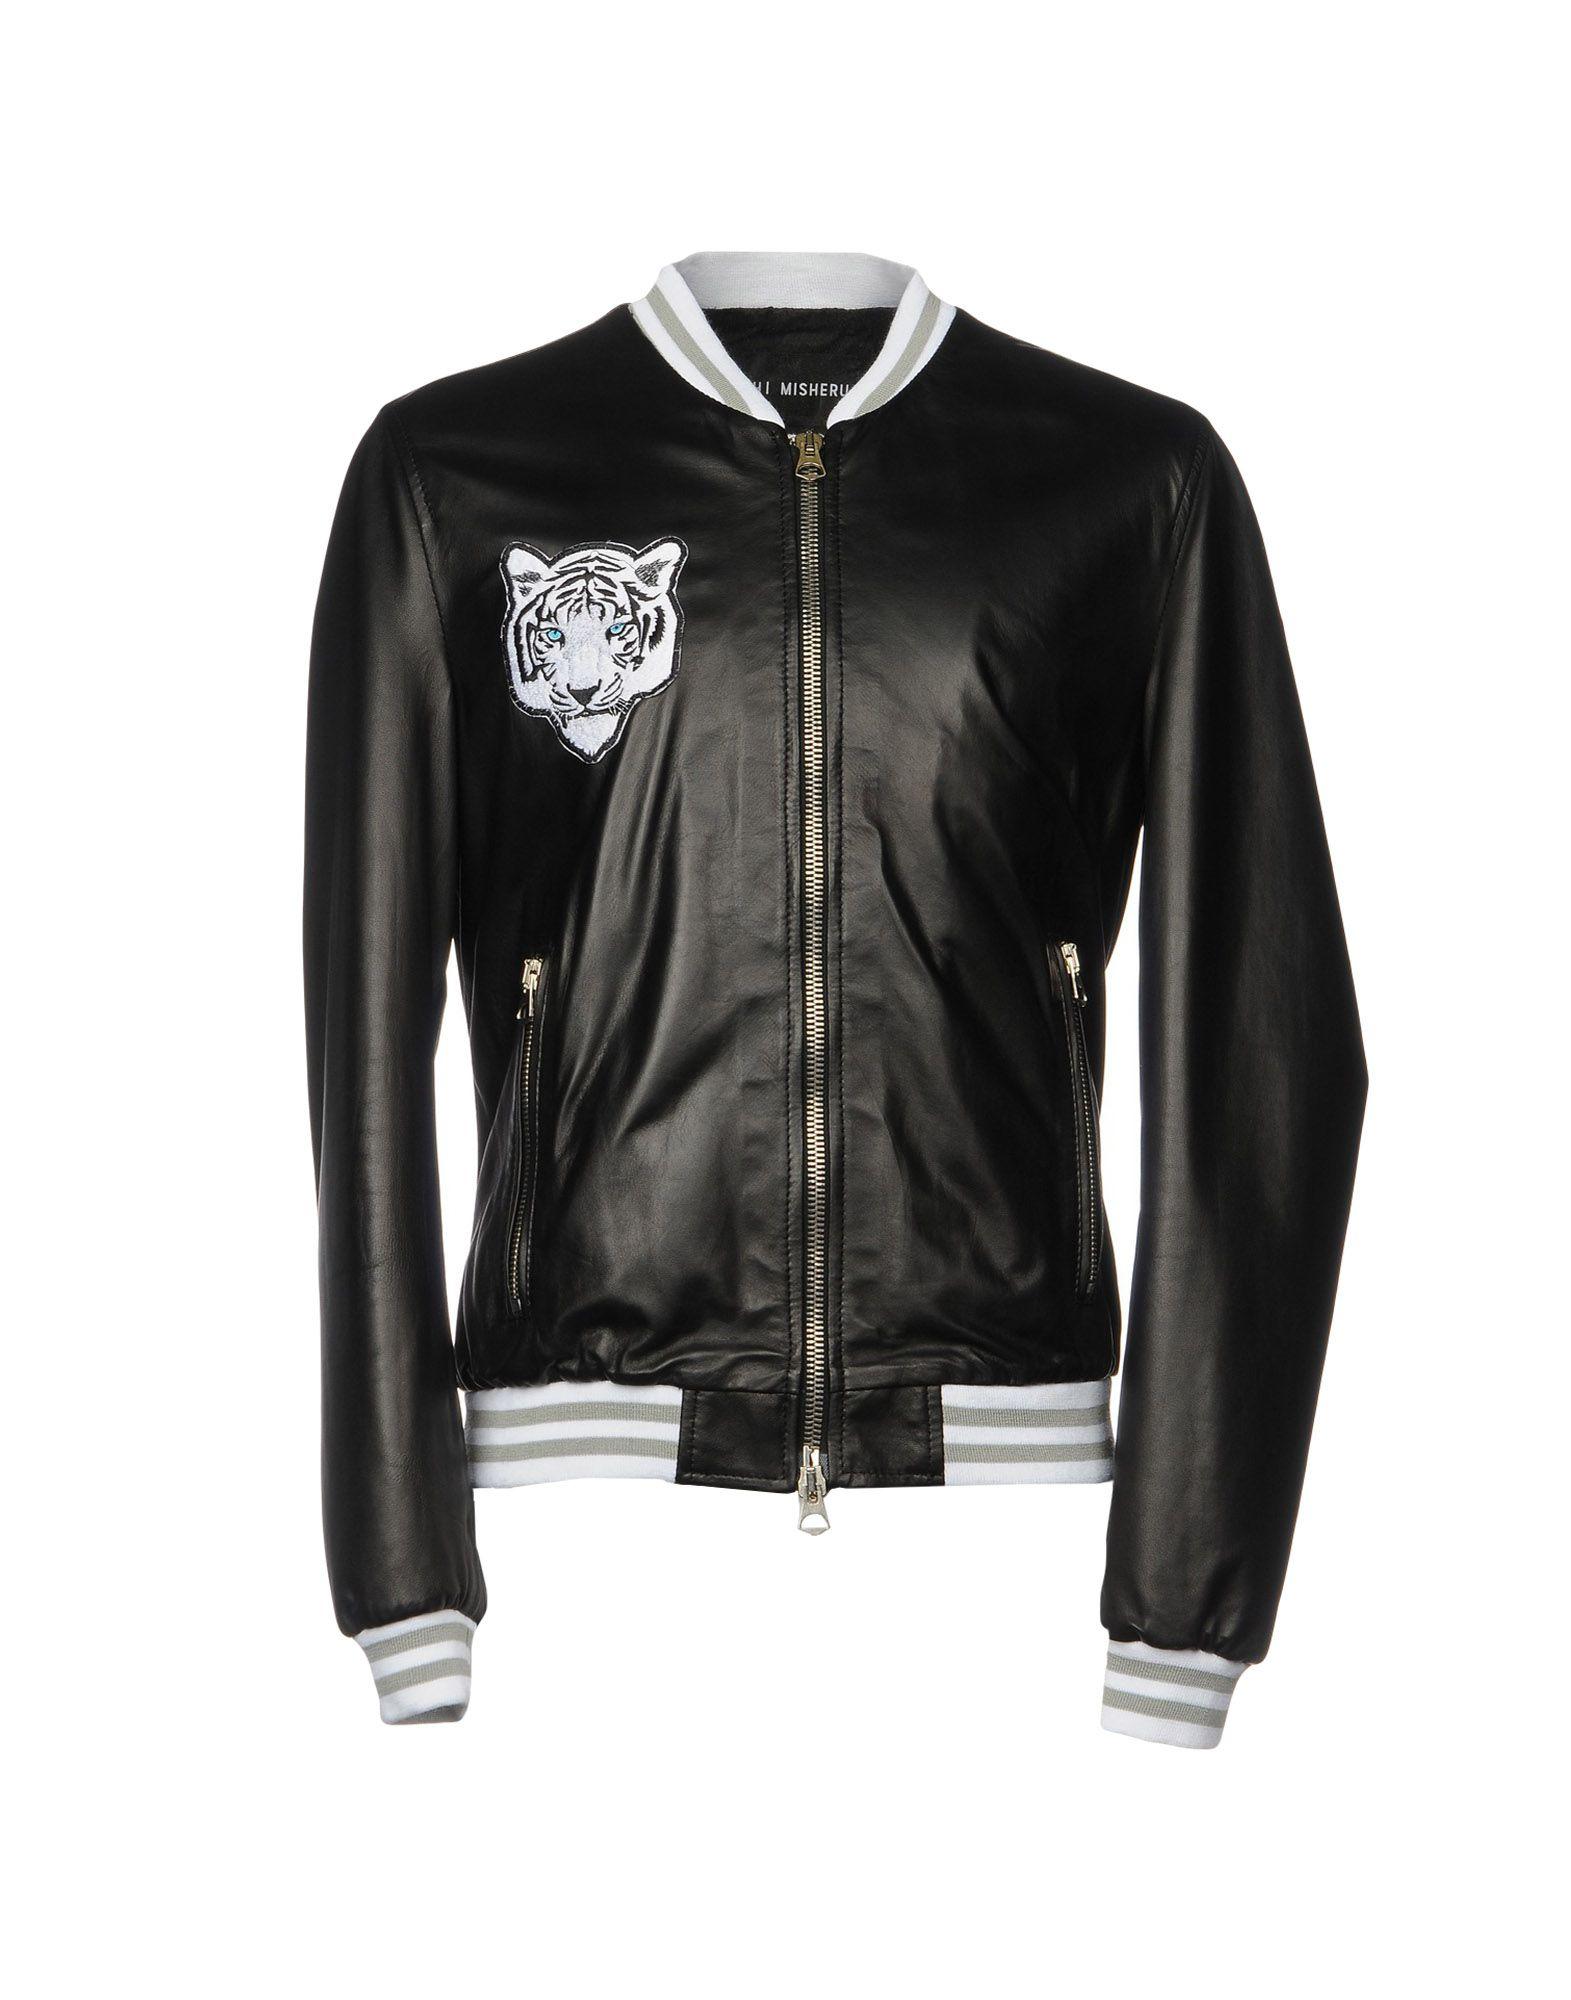 TENSHI MISHERU Куртка цены онлайн